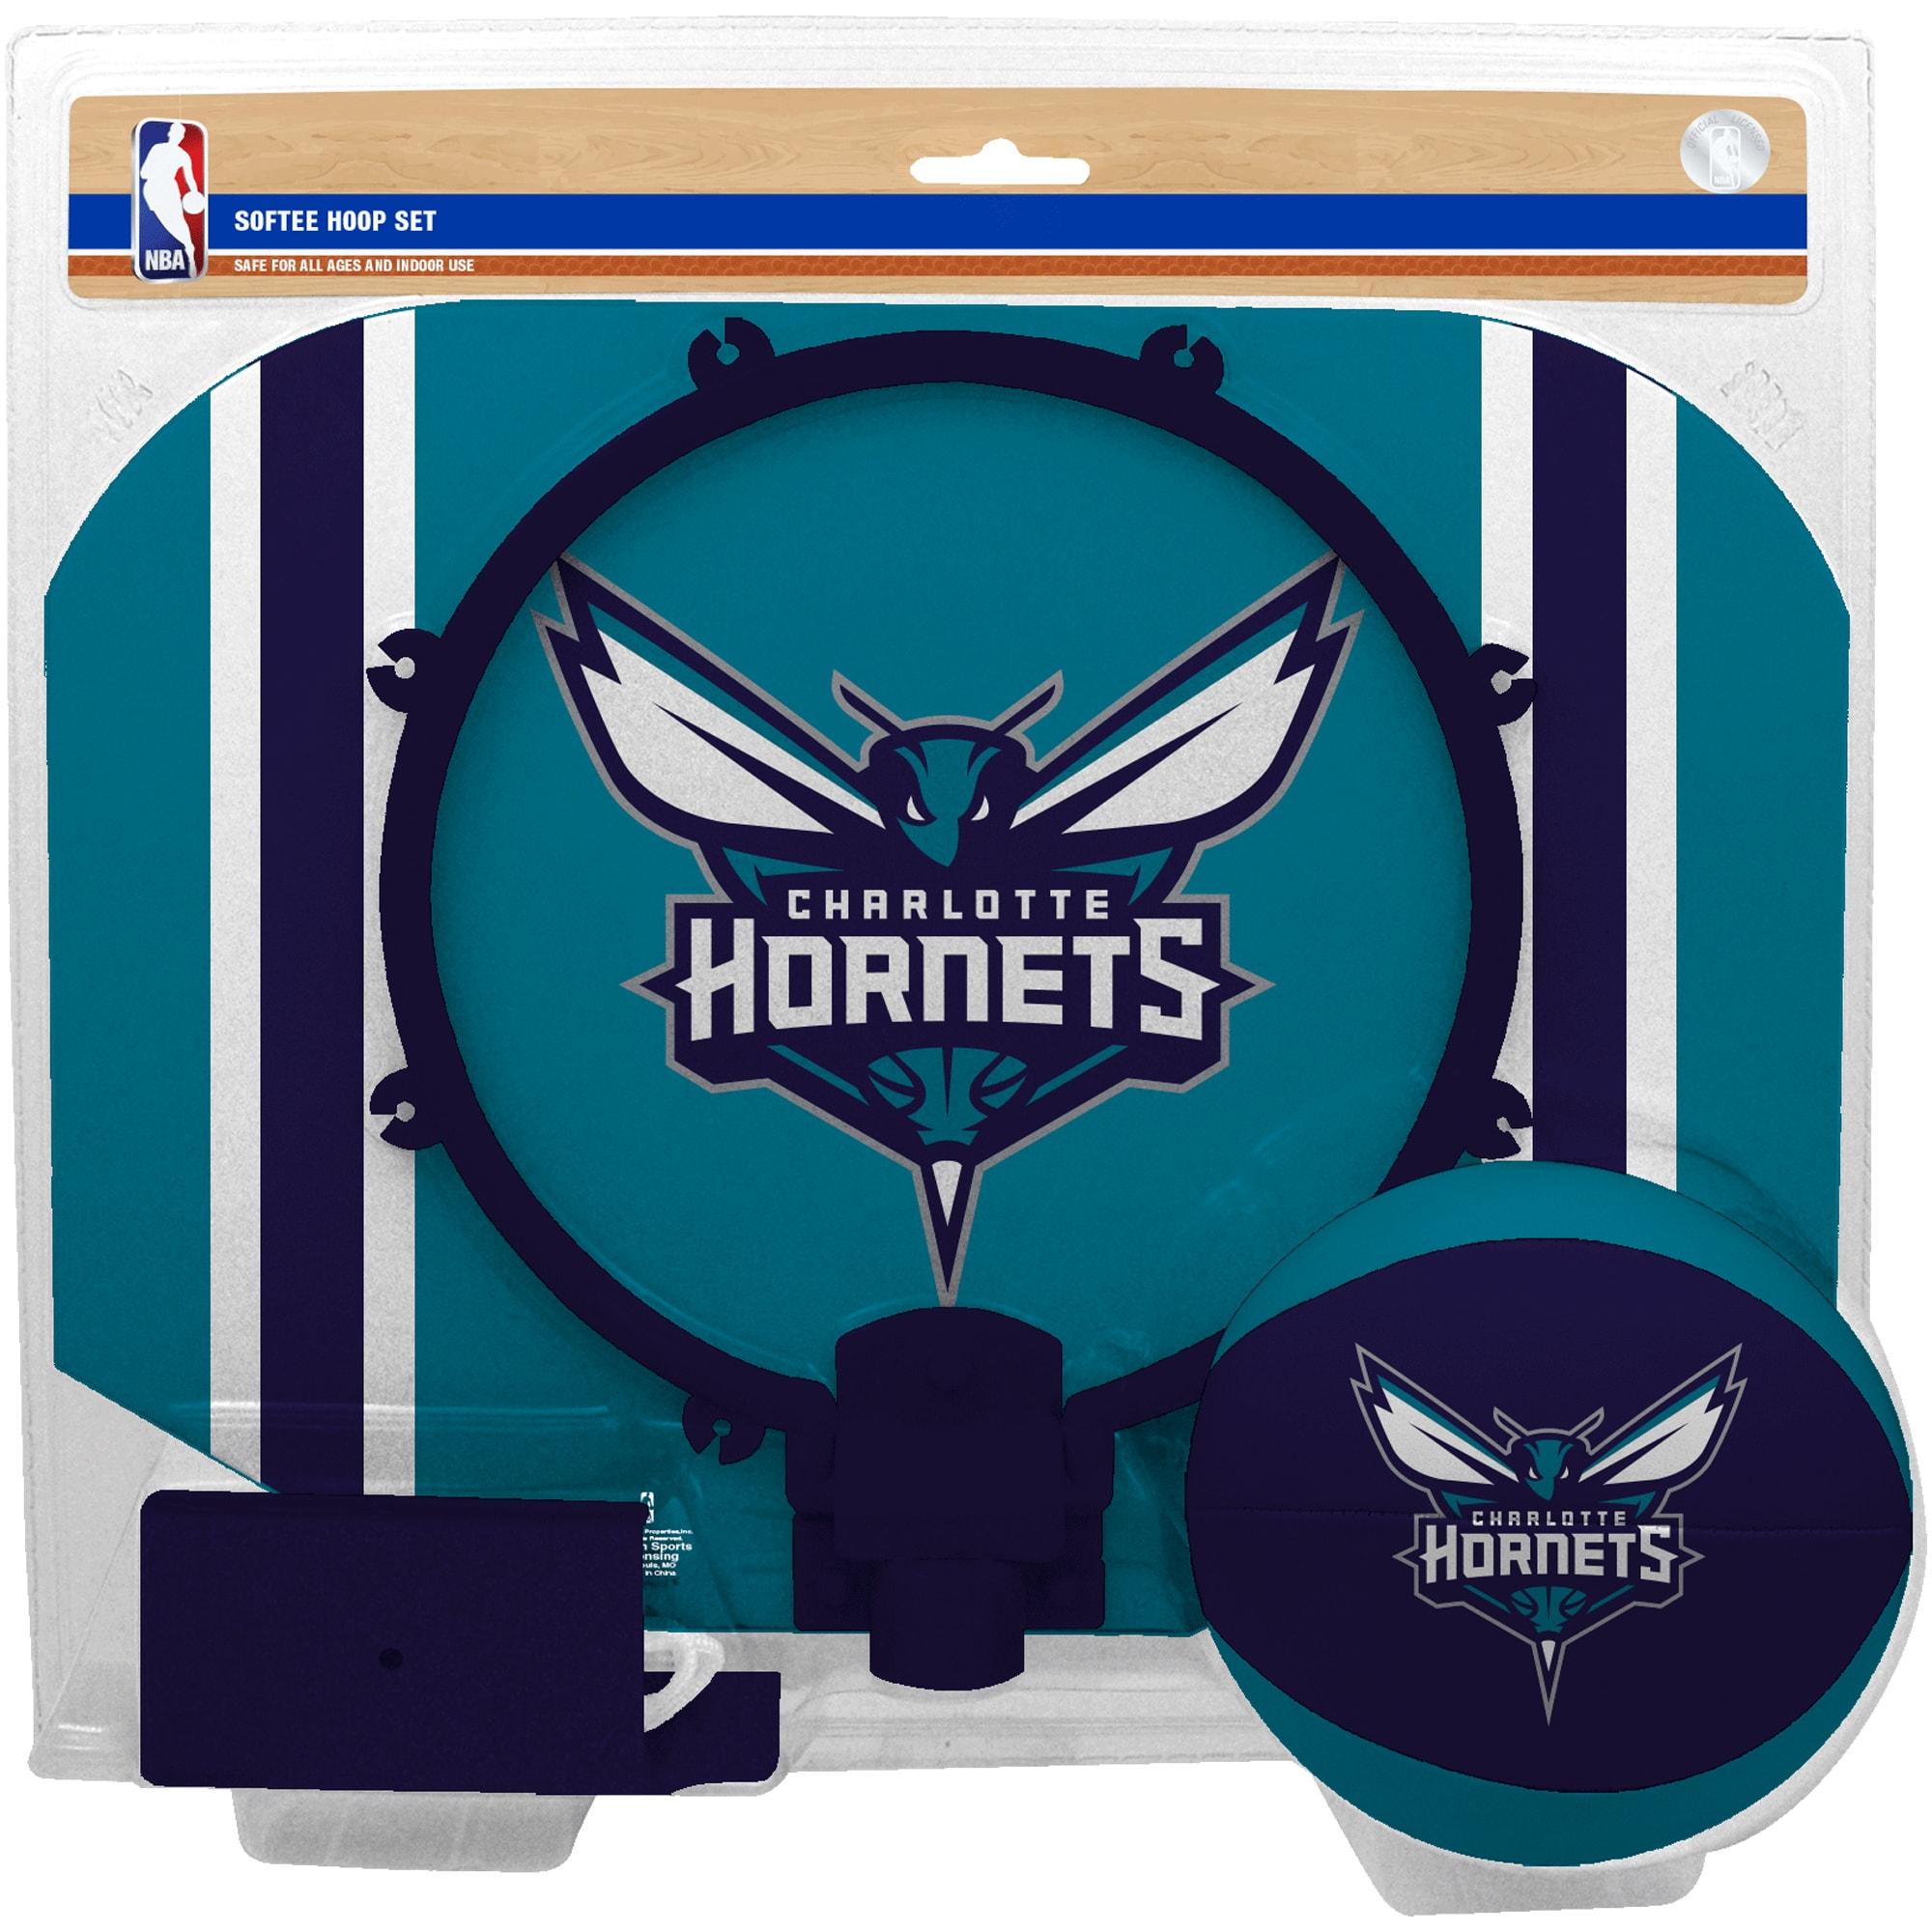 Charlotte Hornets Rawlings Softee Hoop & Ball Set